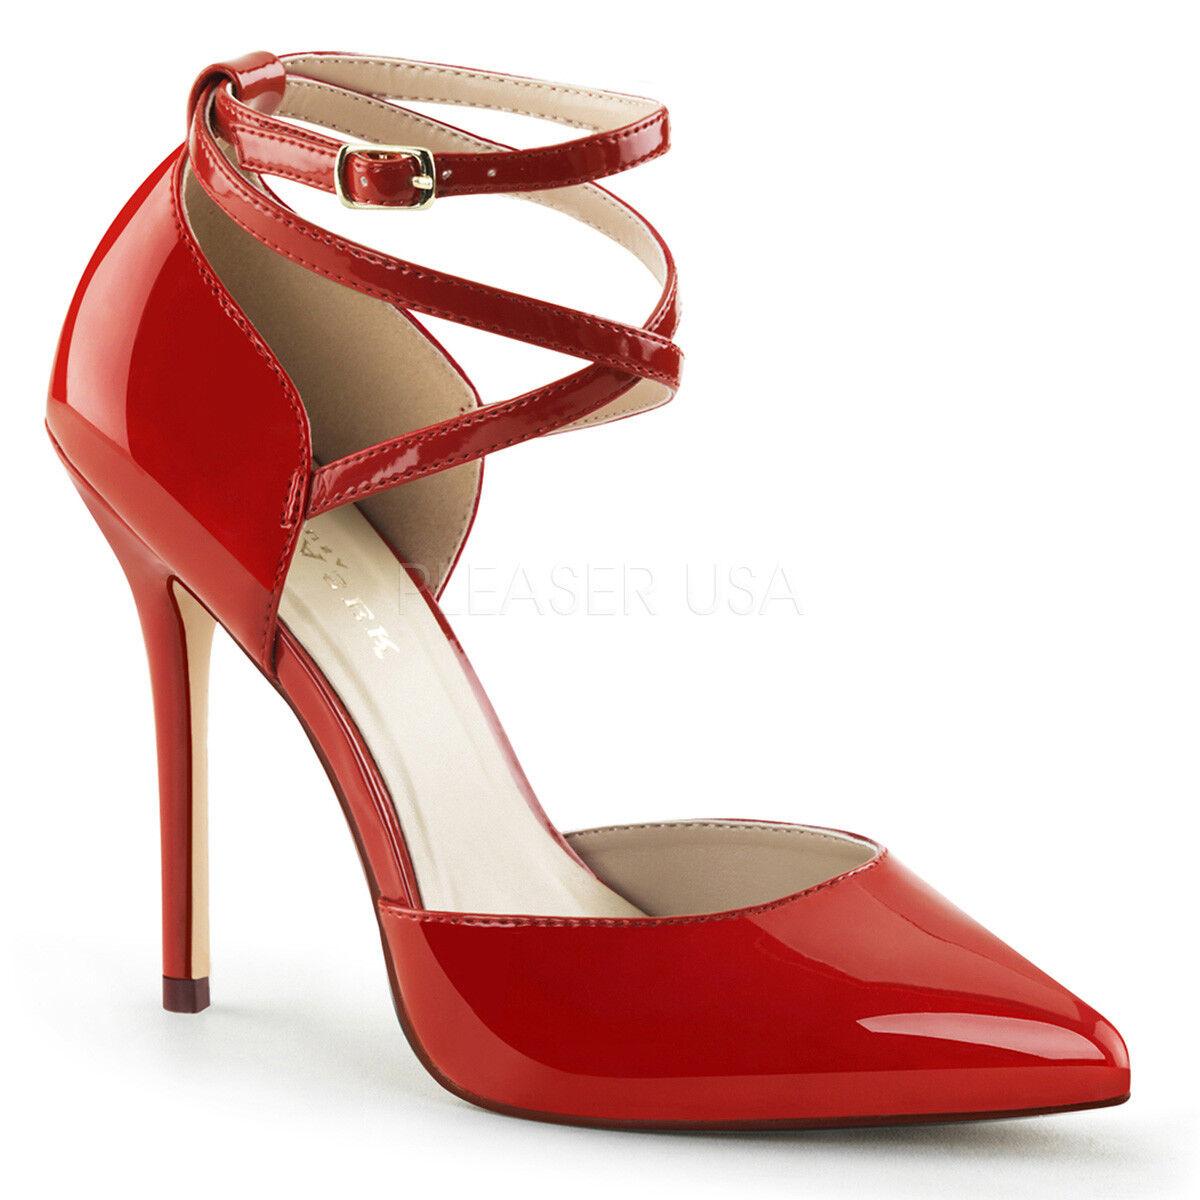 PLEASER AMUSE-25 ROT PATENT CRISS-CROSS STILETTO HEEL Schuhe